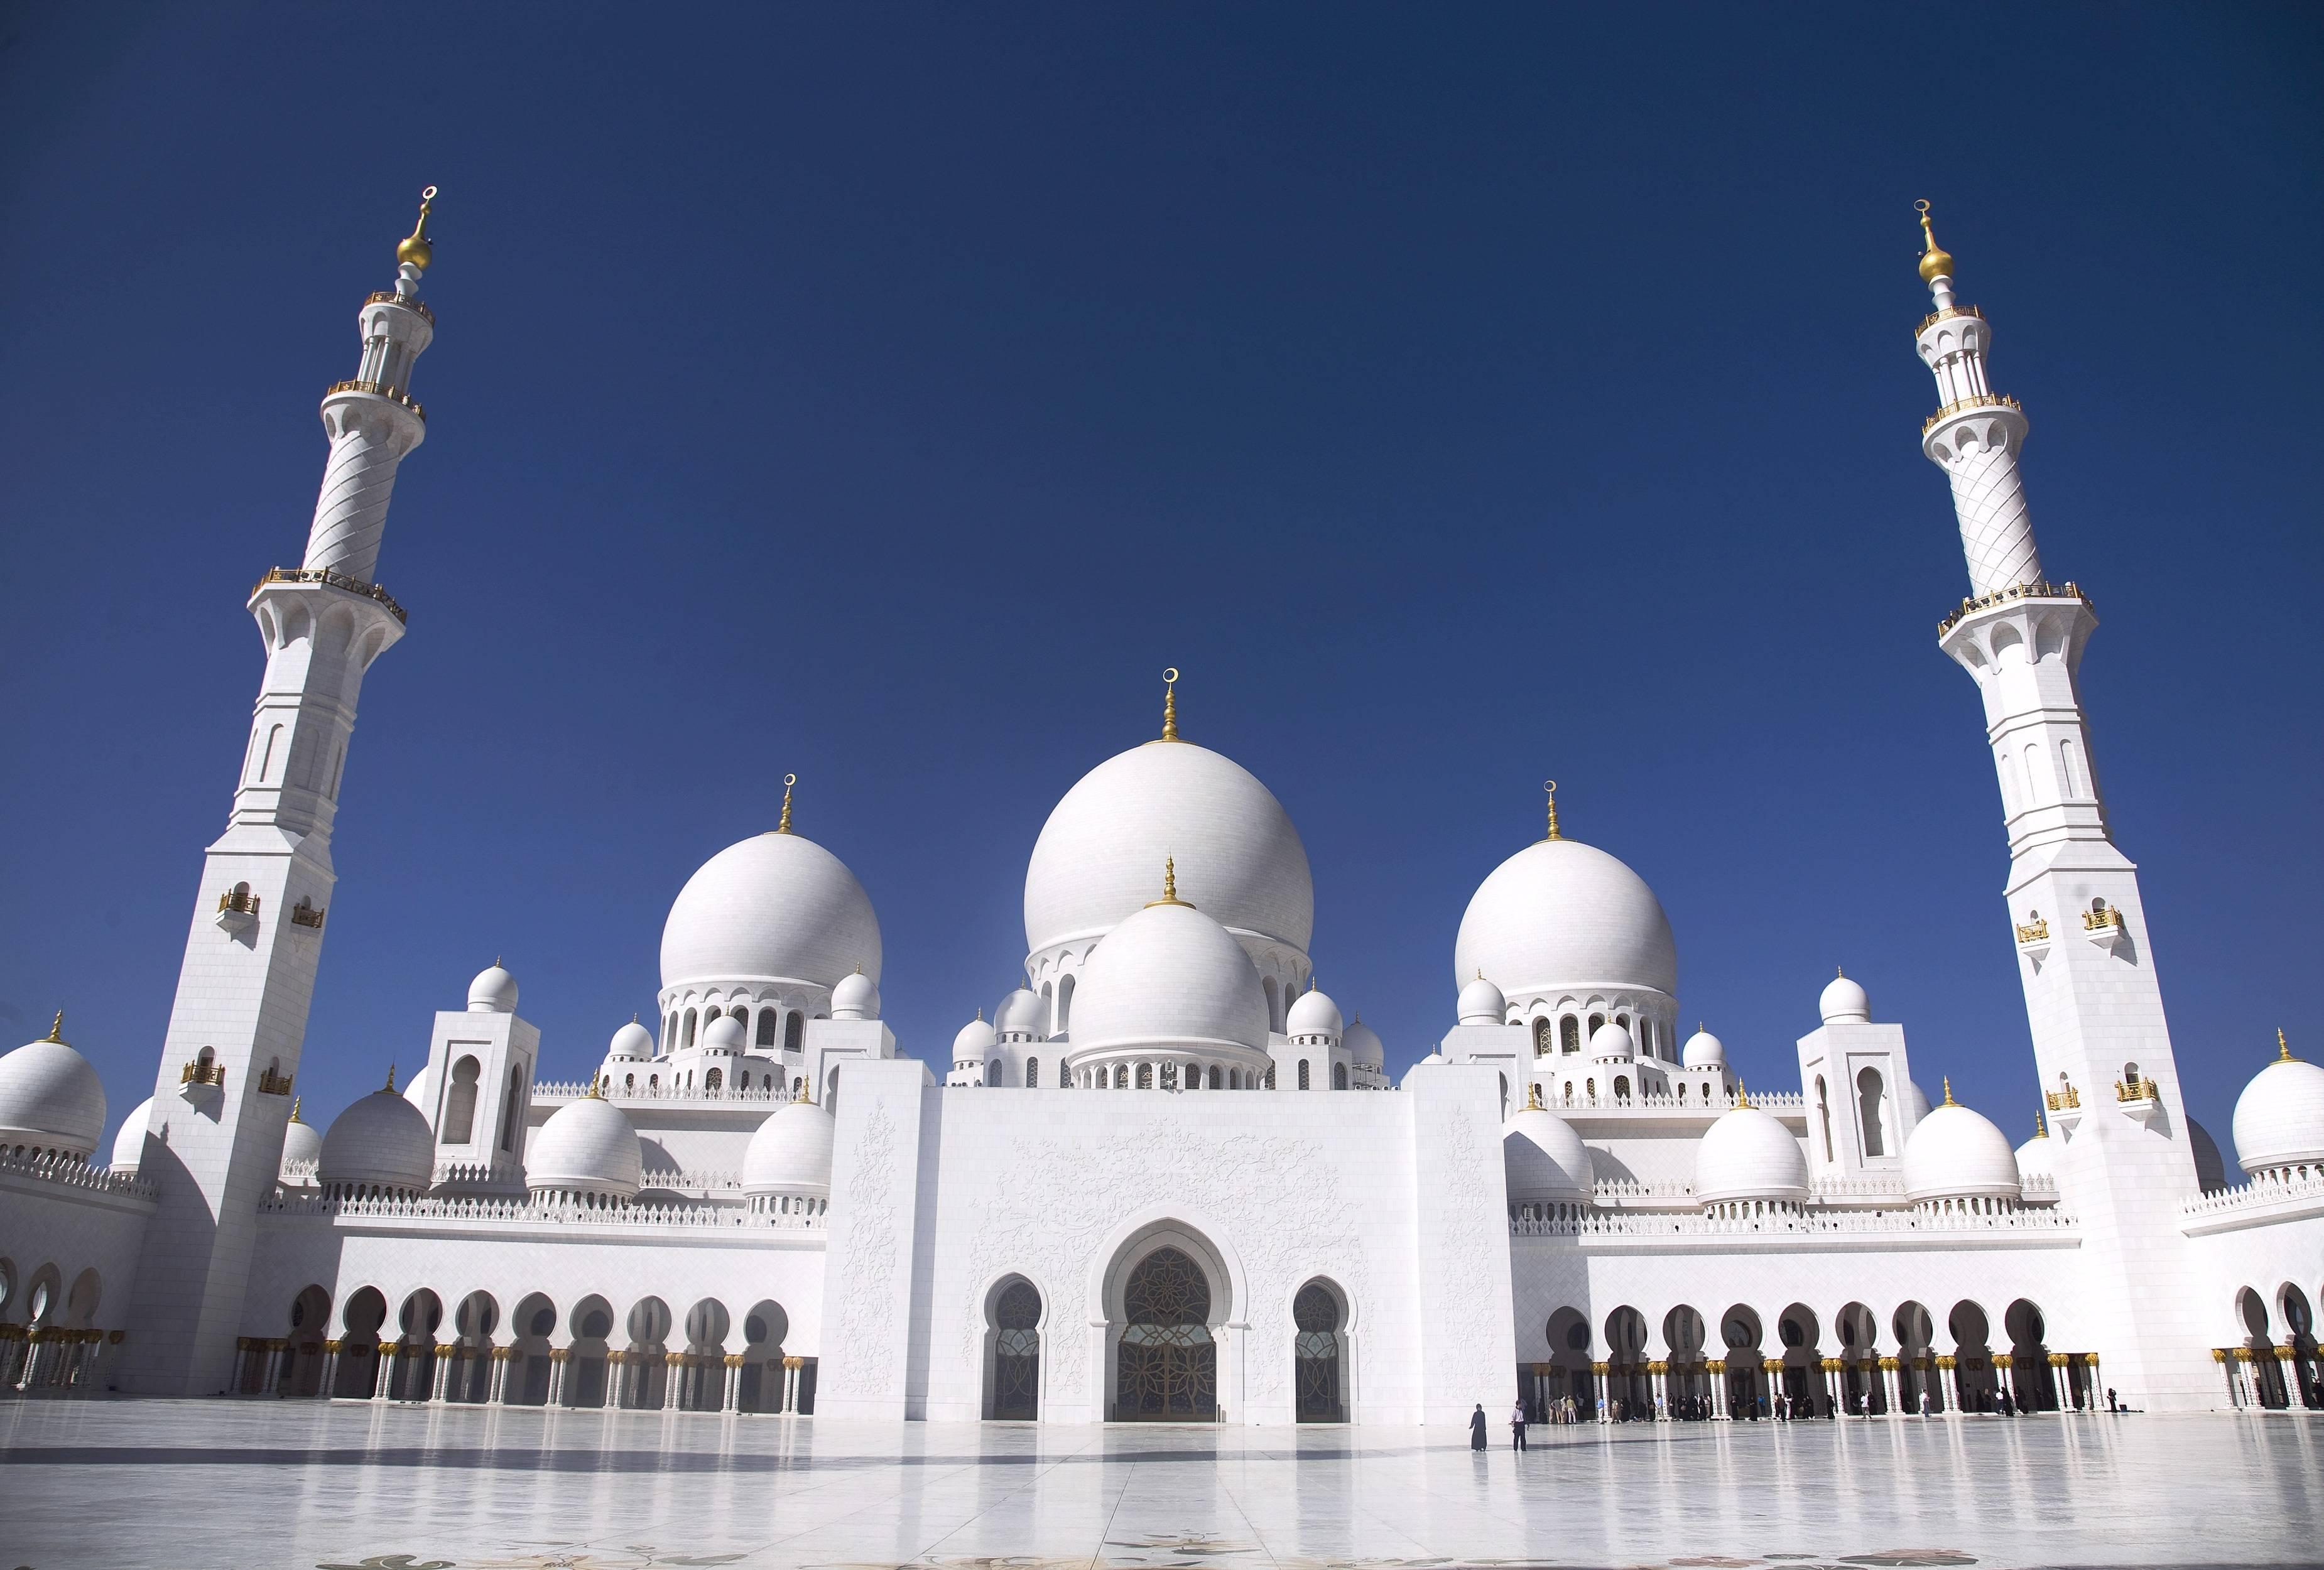 Mosque Wallpapers - Wallpaper Cave